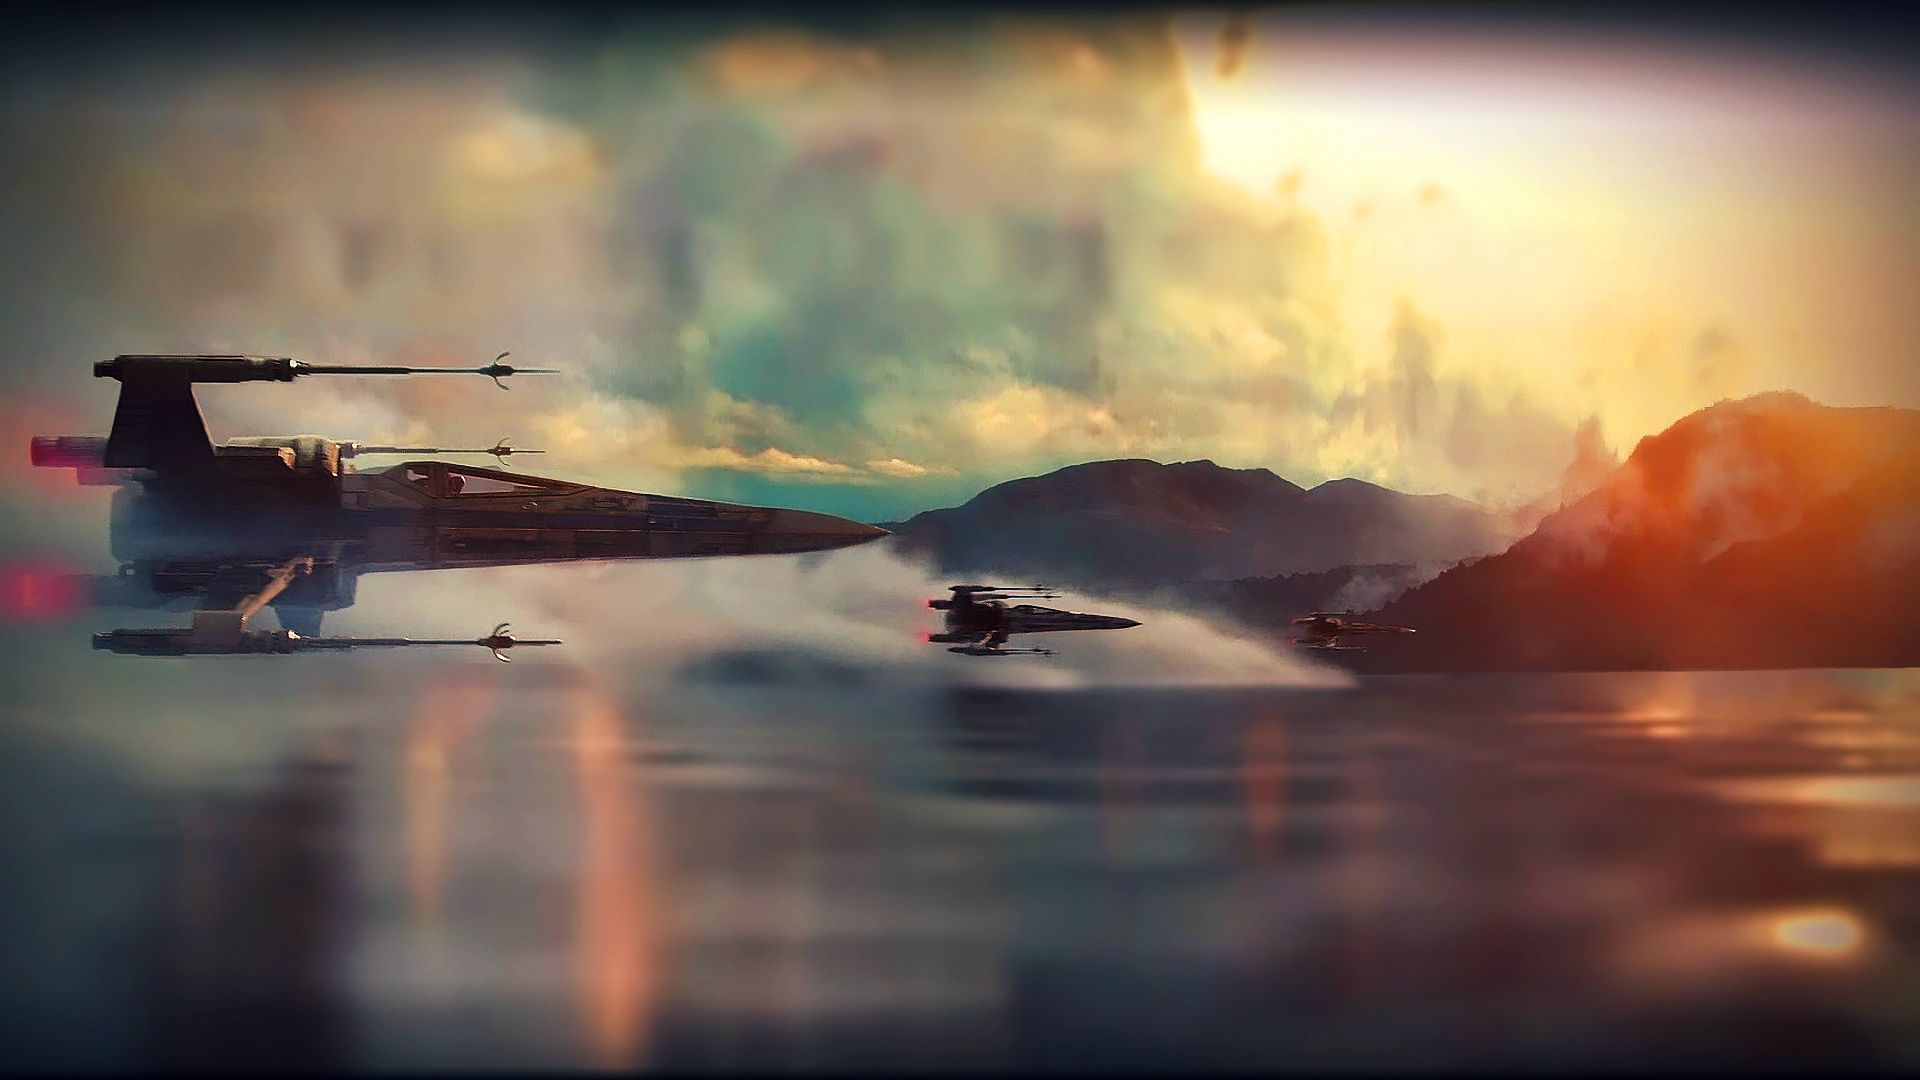 Wallpapers Movies Star Wars Star wars X-wing